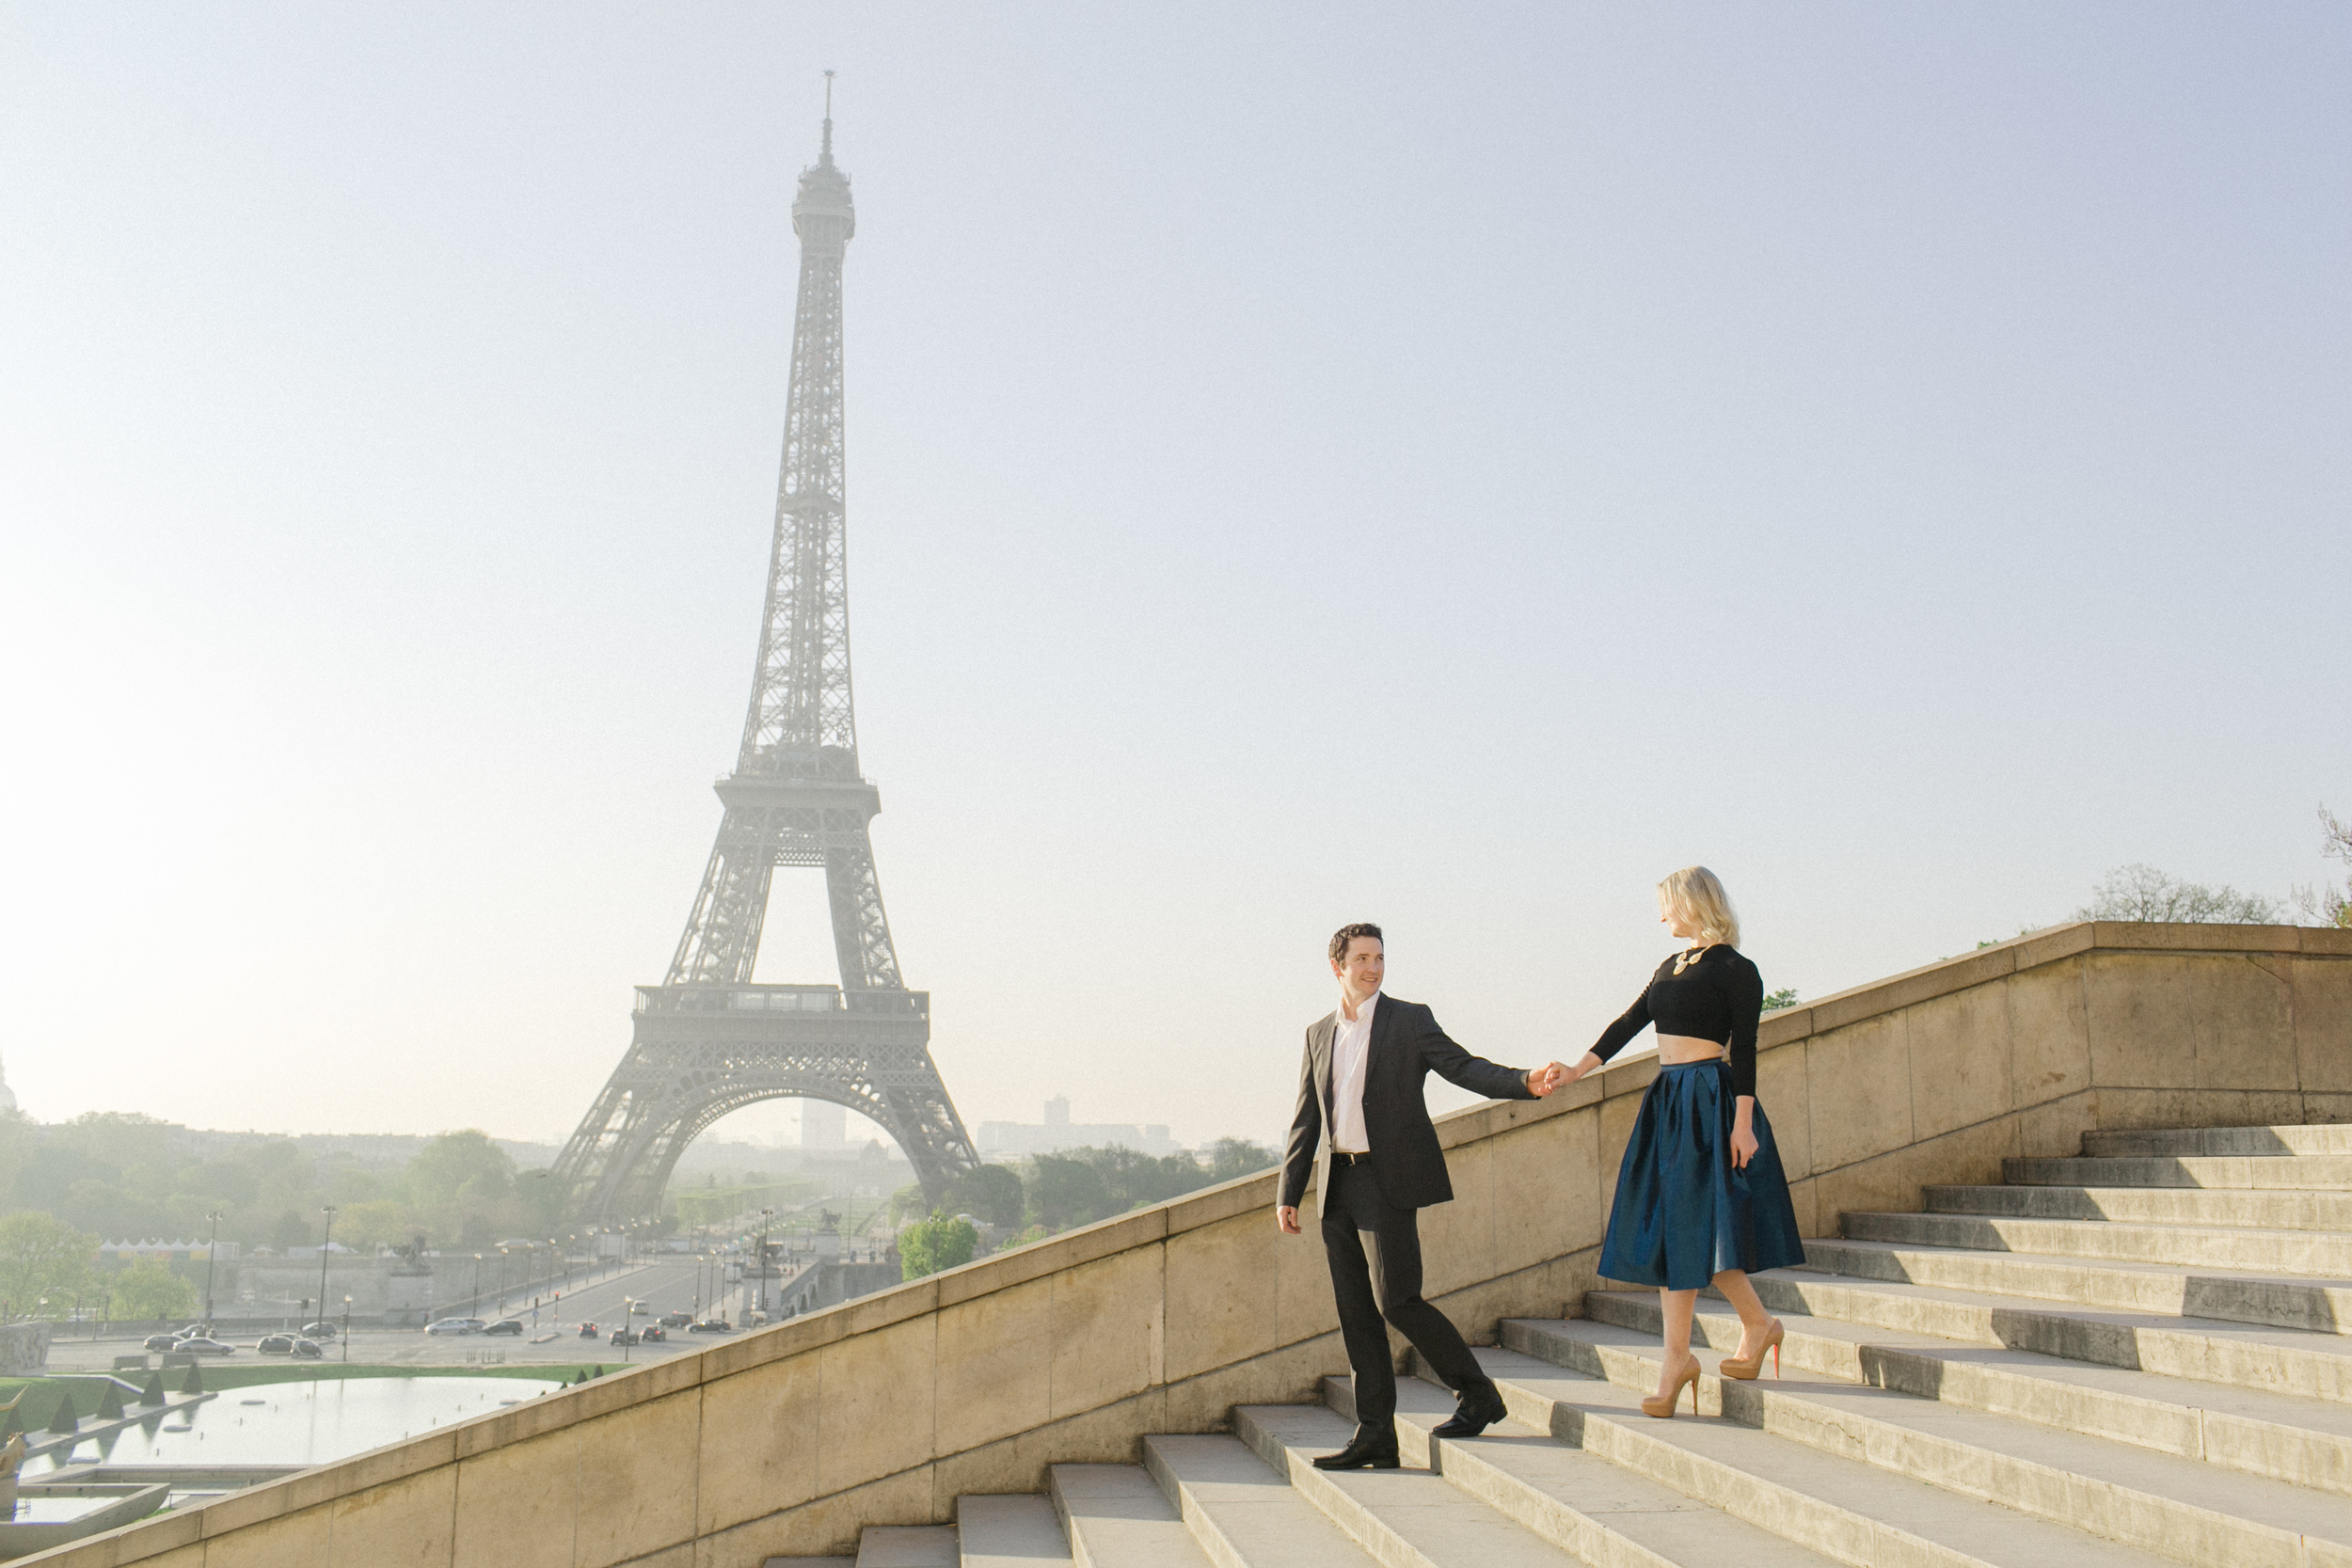 richelle-hunter-photography-paris-wedding-photographer-emily-tyrell-17.jpg